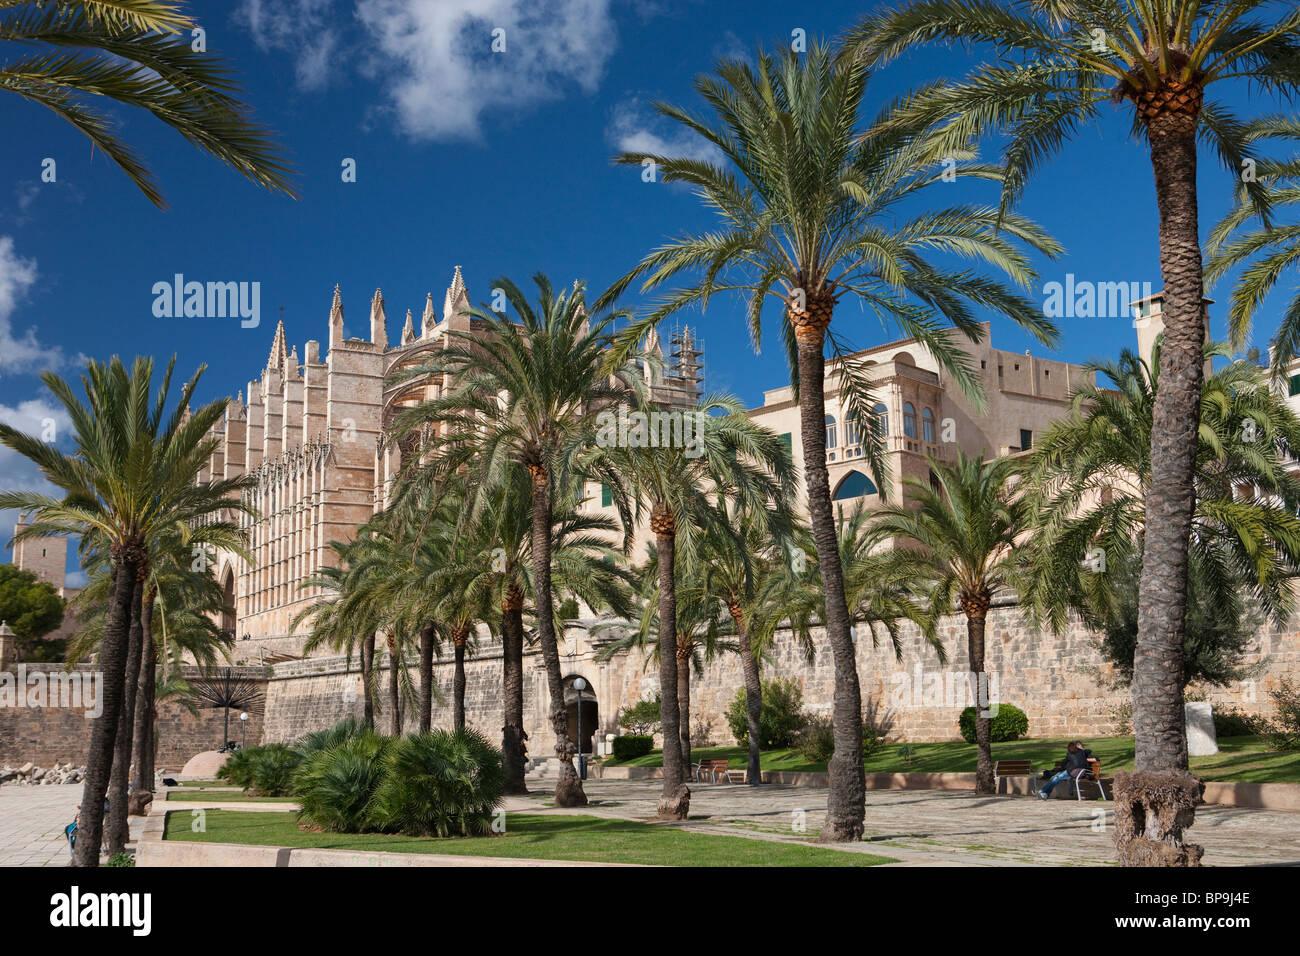 La Seu Cathedral, Palma de Mallorca, Spain - Stock Image